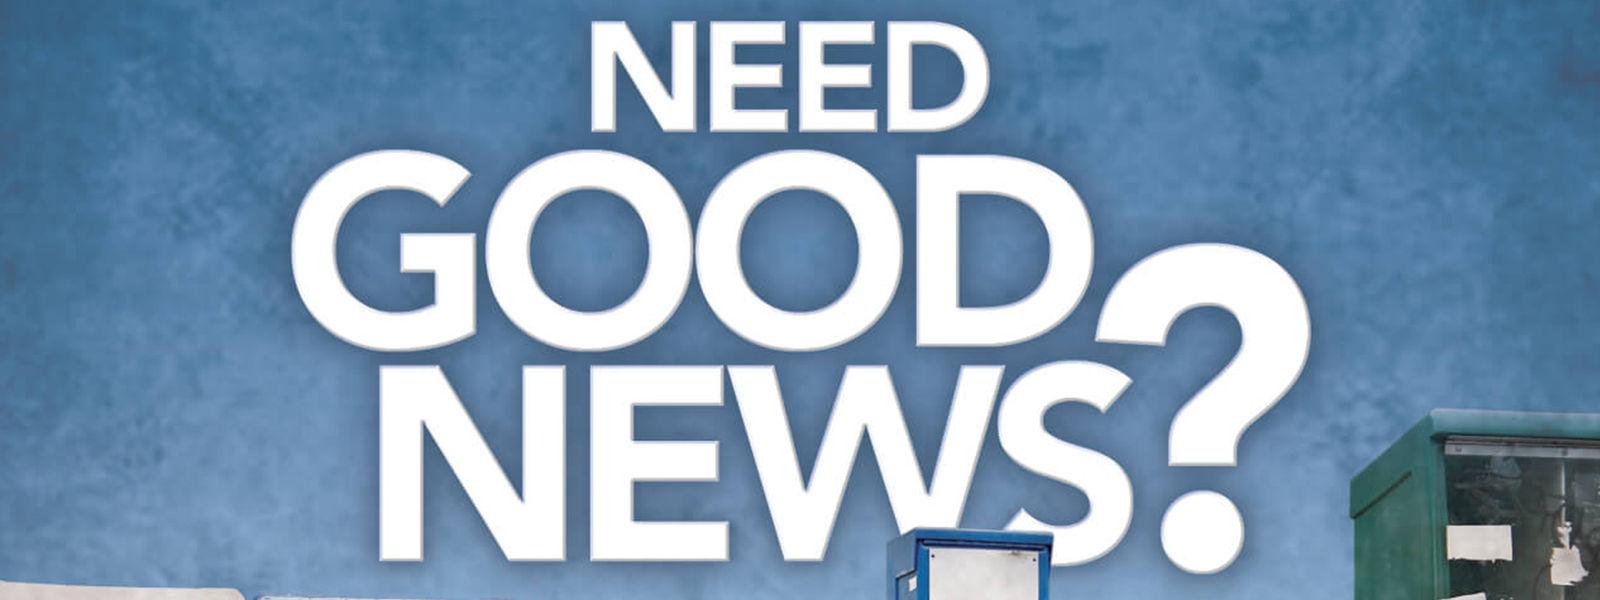 Need Good News?